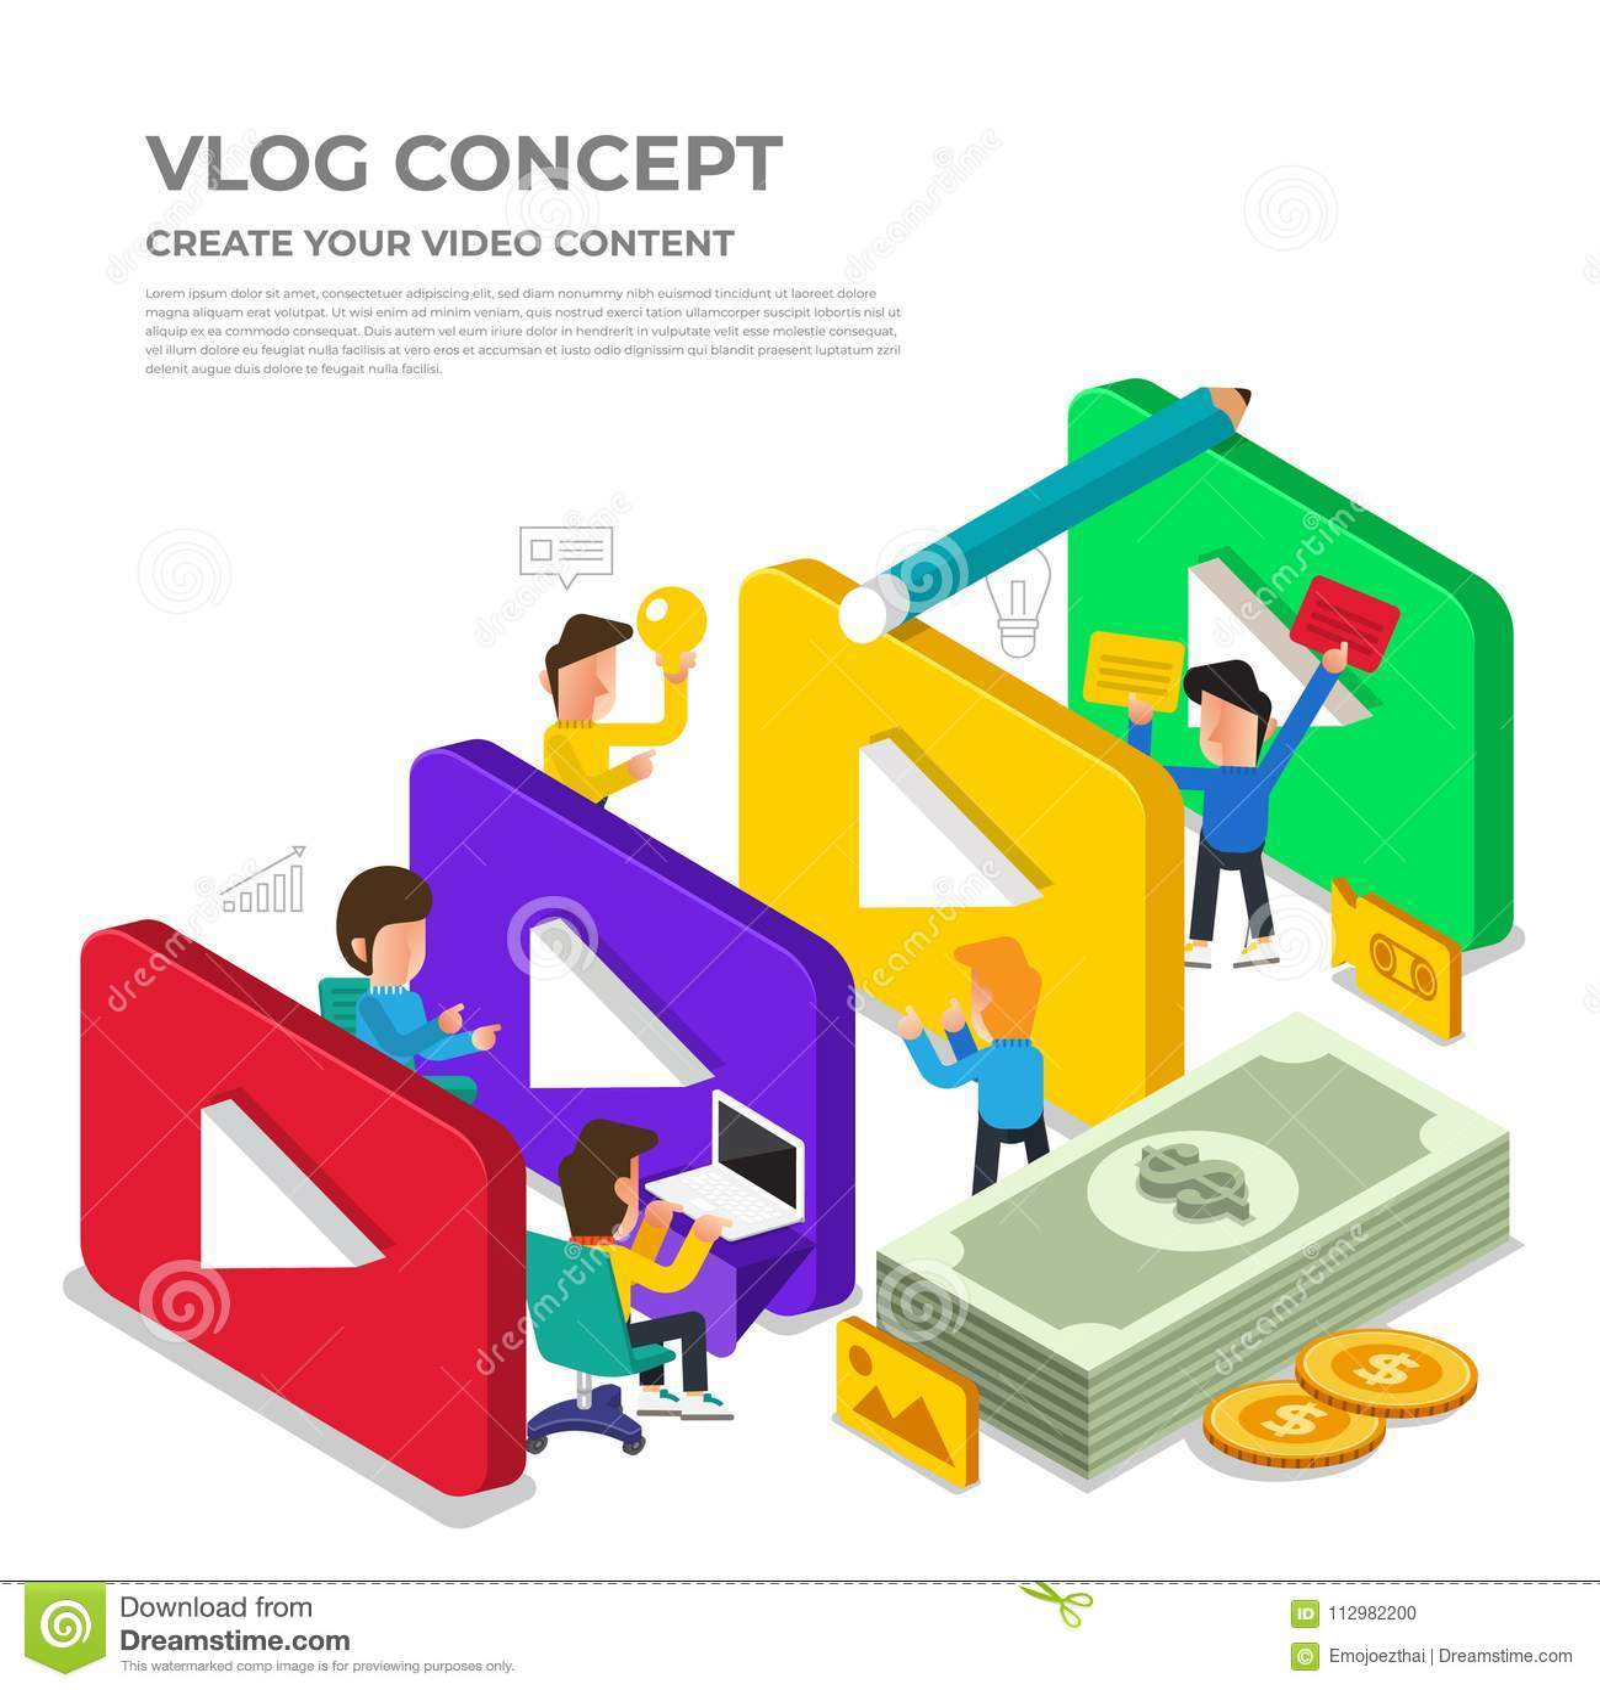 Flat design vlog concept. Create video content and make money. V